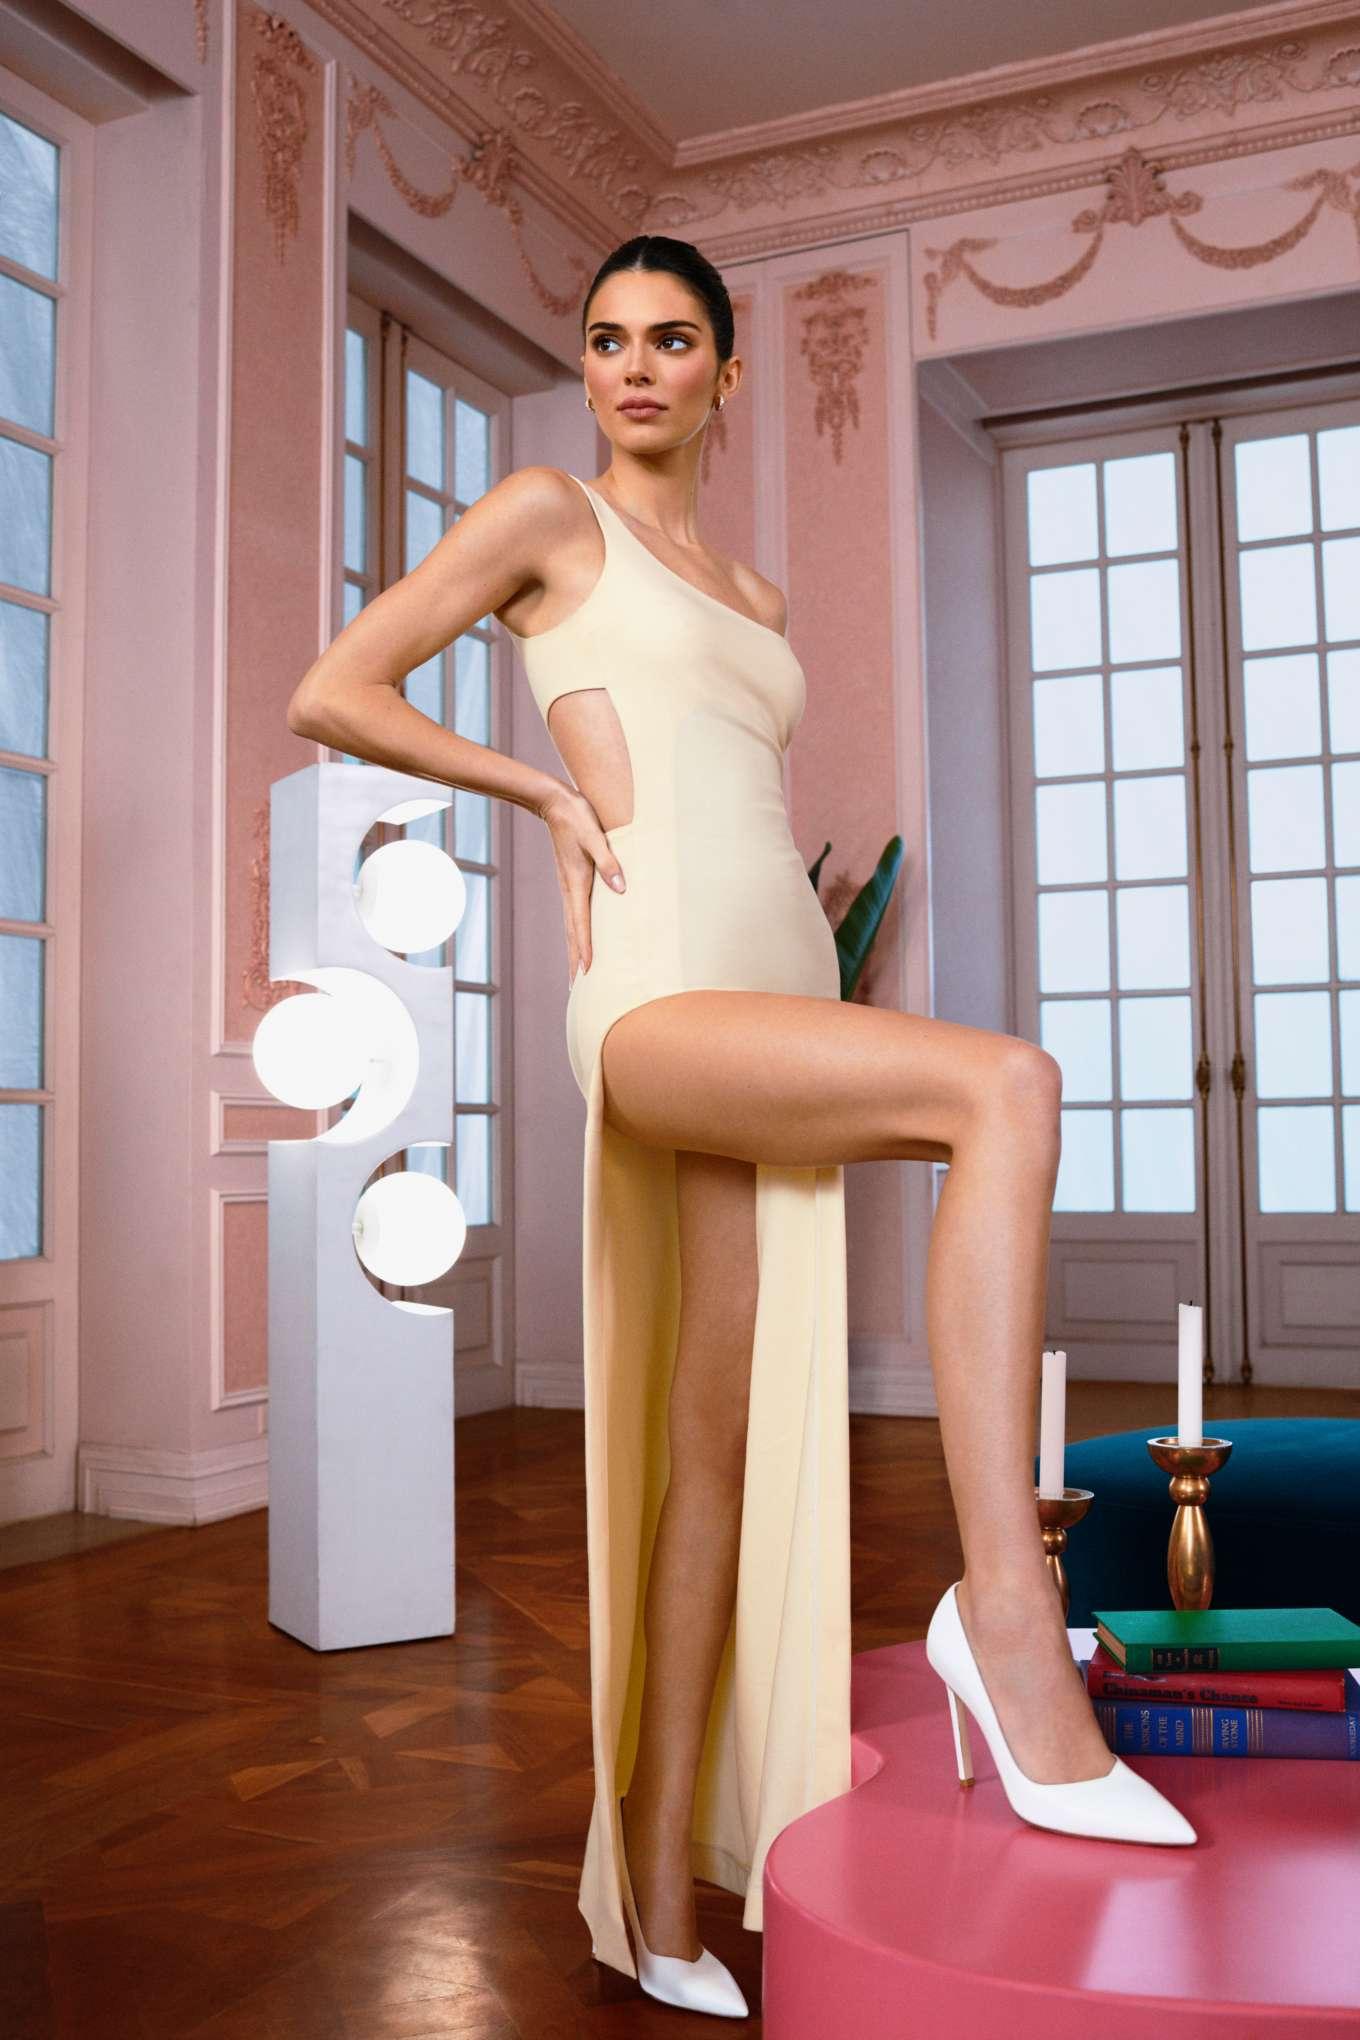 Kendall Jenner - Stuart Weitzman photoshoot for Vogue